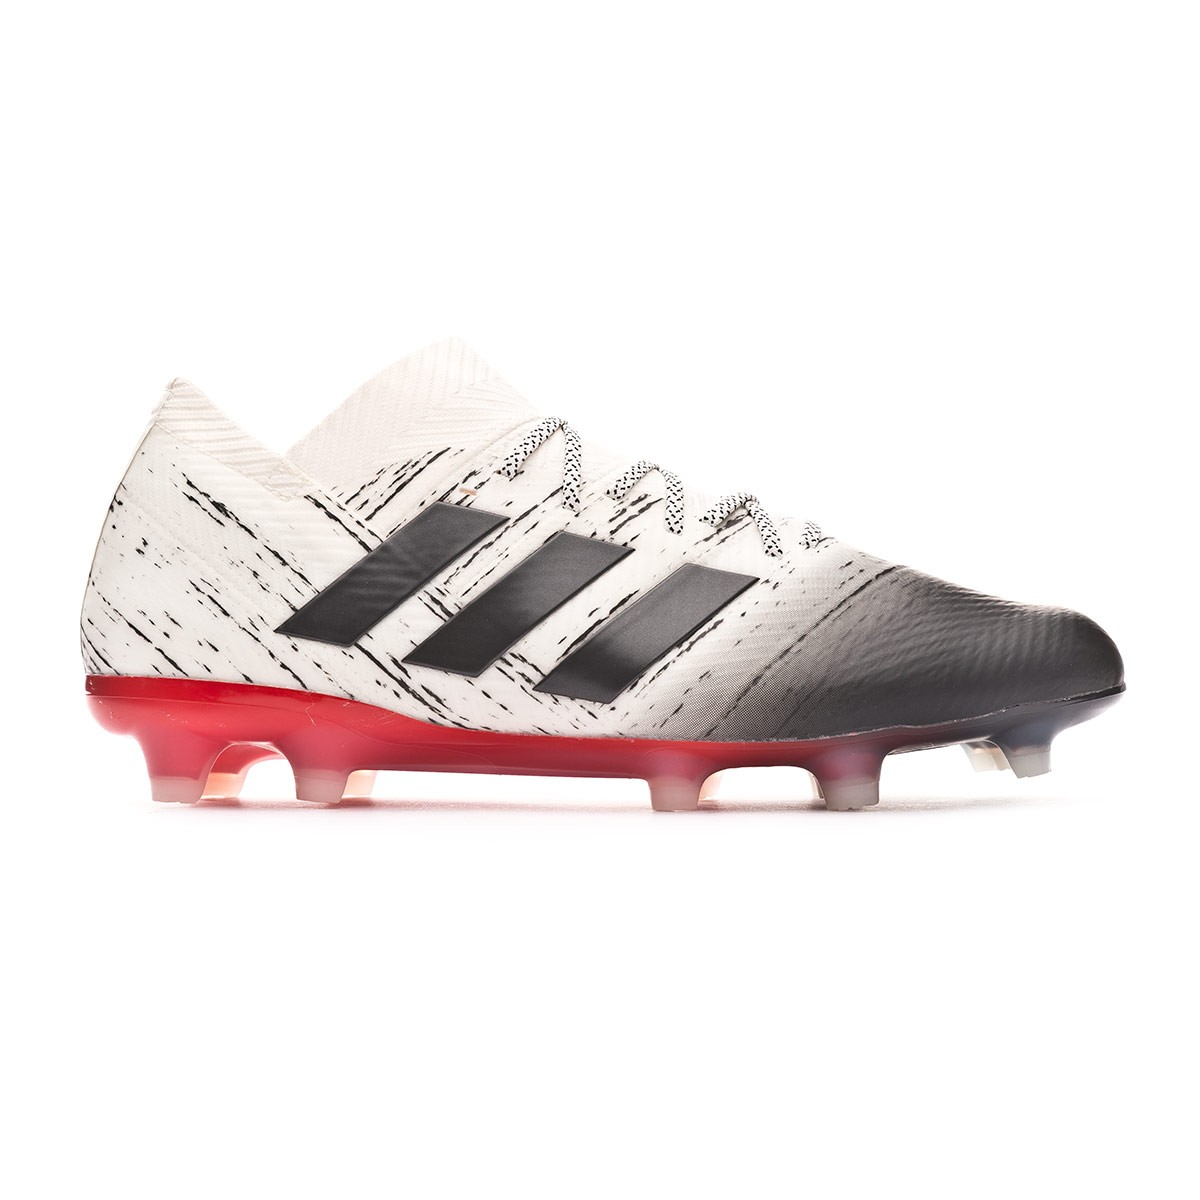 bdb252f7ace9 Football Boots adidas Nemeziz 18.1 FG Off white-Core black-Active red -  Tienda de fútbol Fútbol Emotion